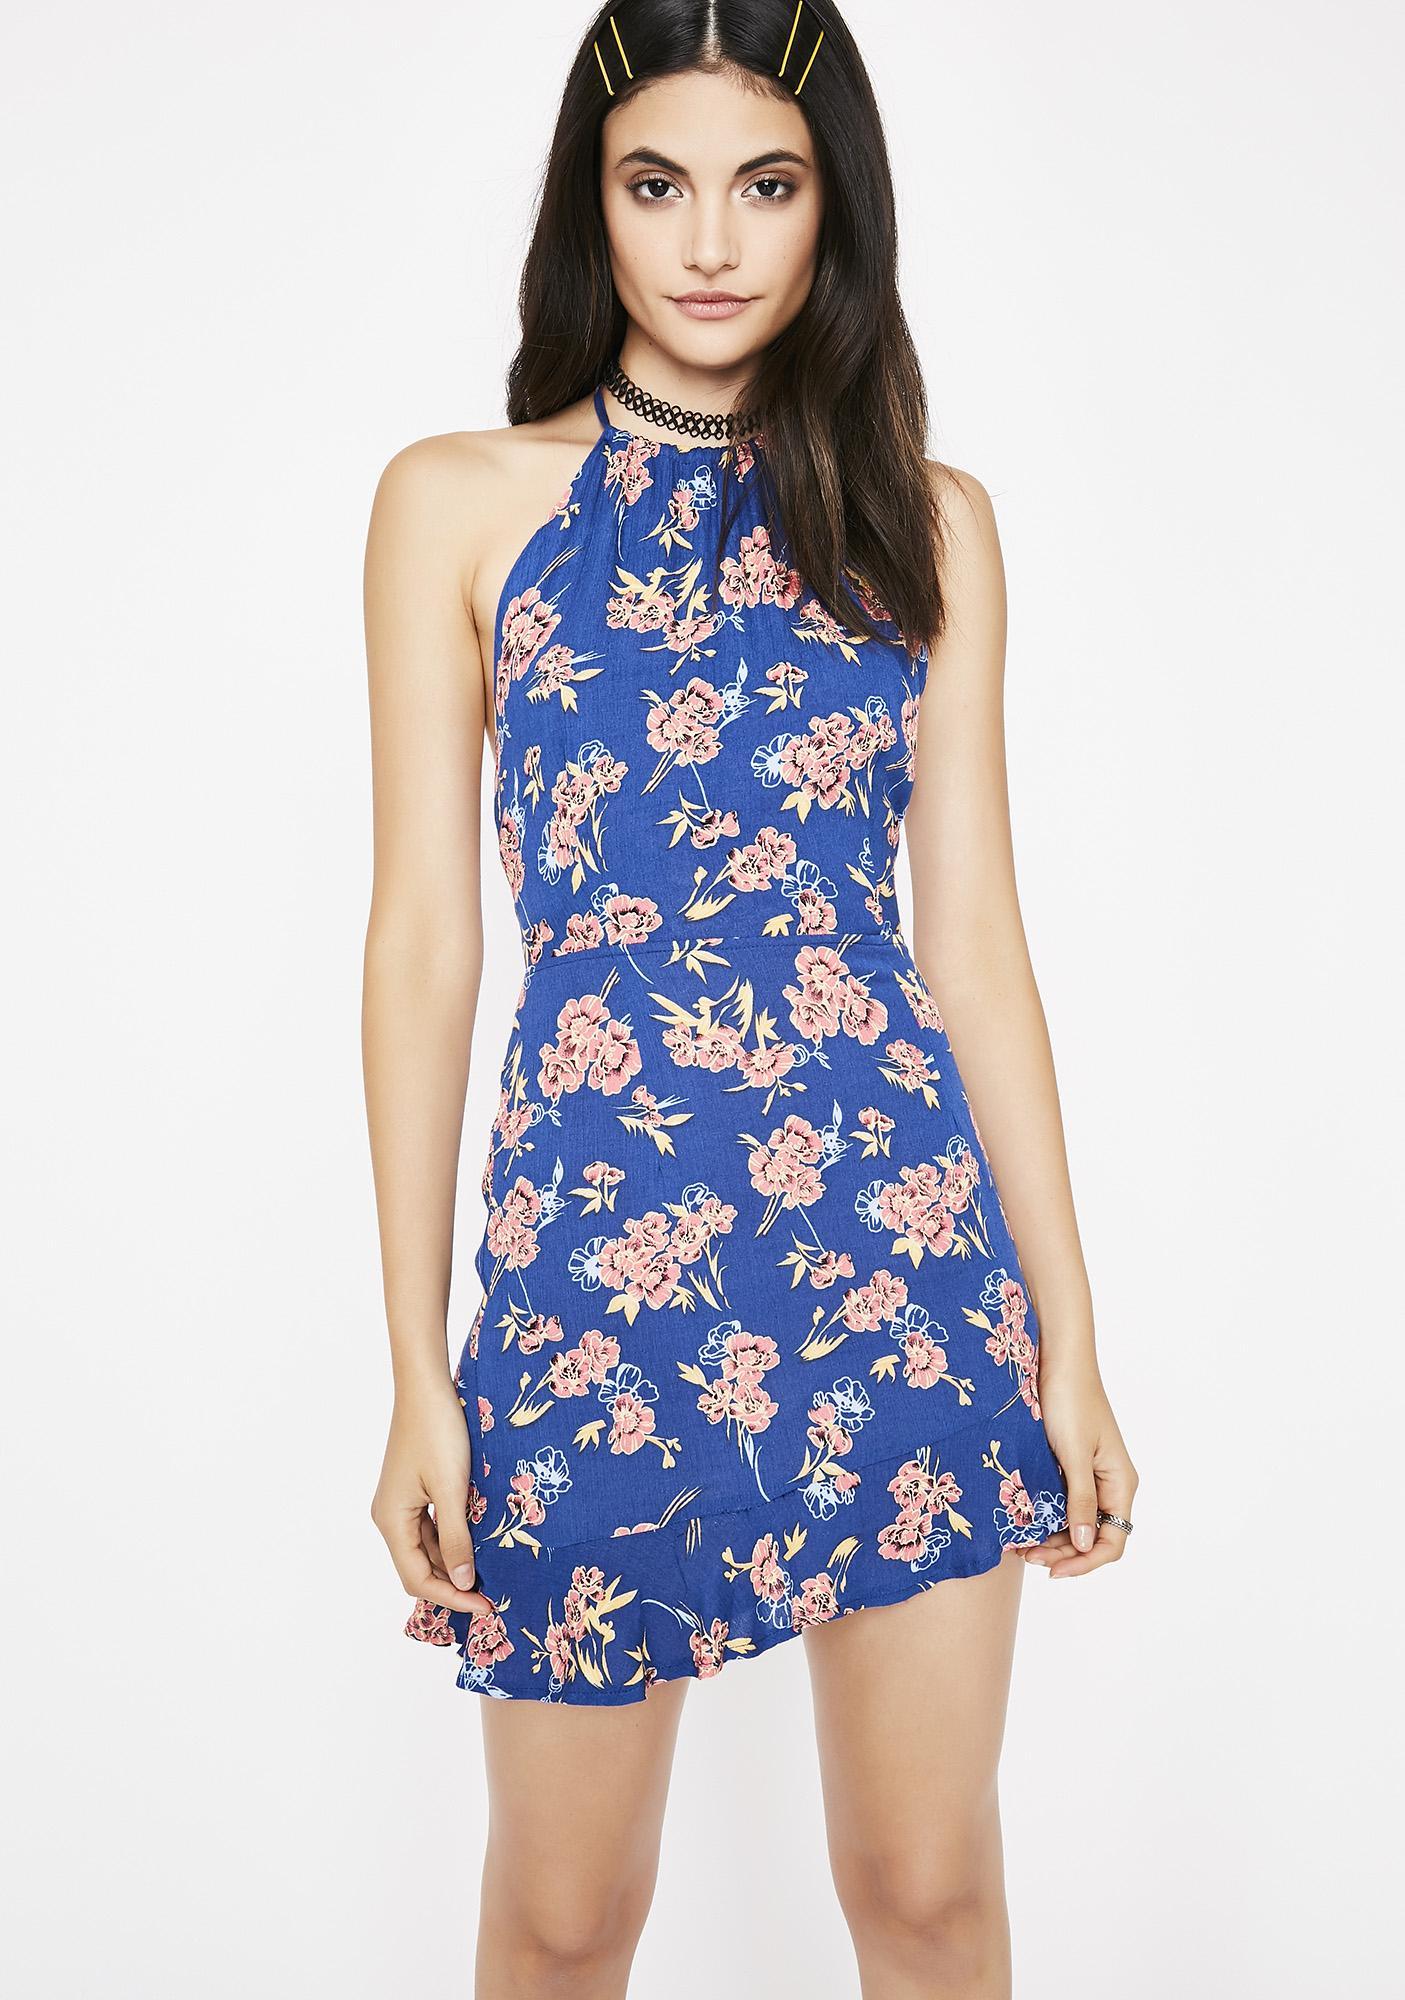 Play Date Halter Dress